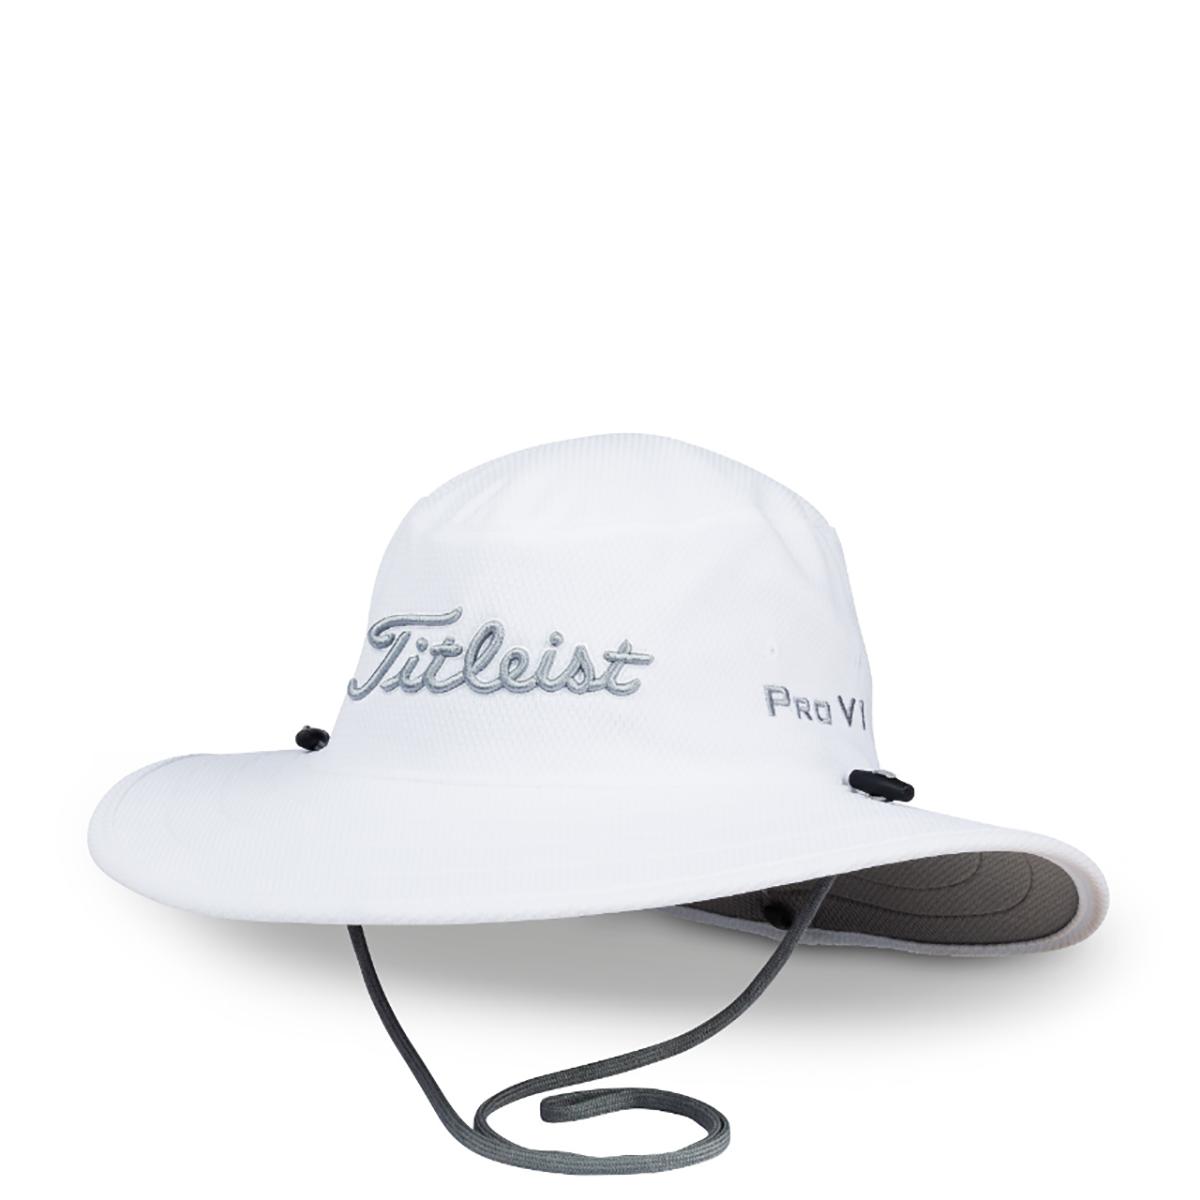 0d68b251 Titleist Tour Aussie Hat | PGA TOUR Superstore